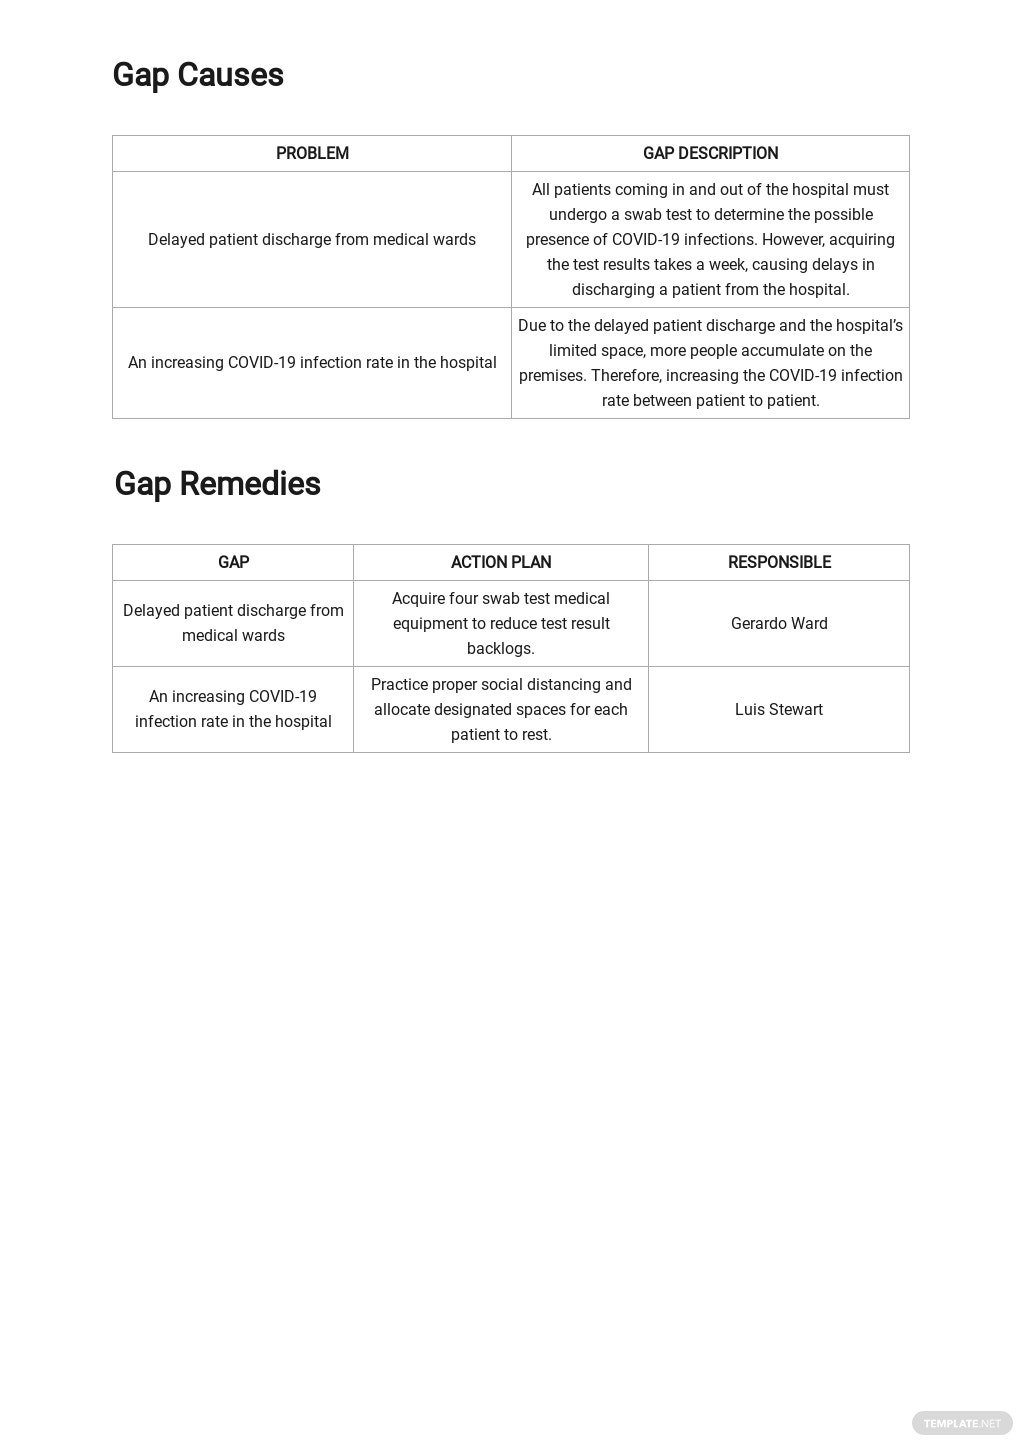 Healthcare Gap Analysis Template 2.jpe